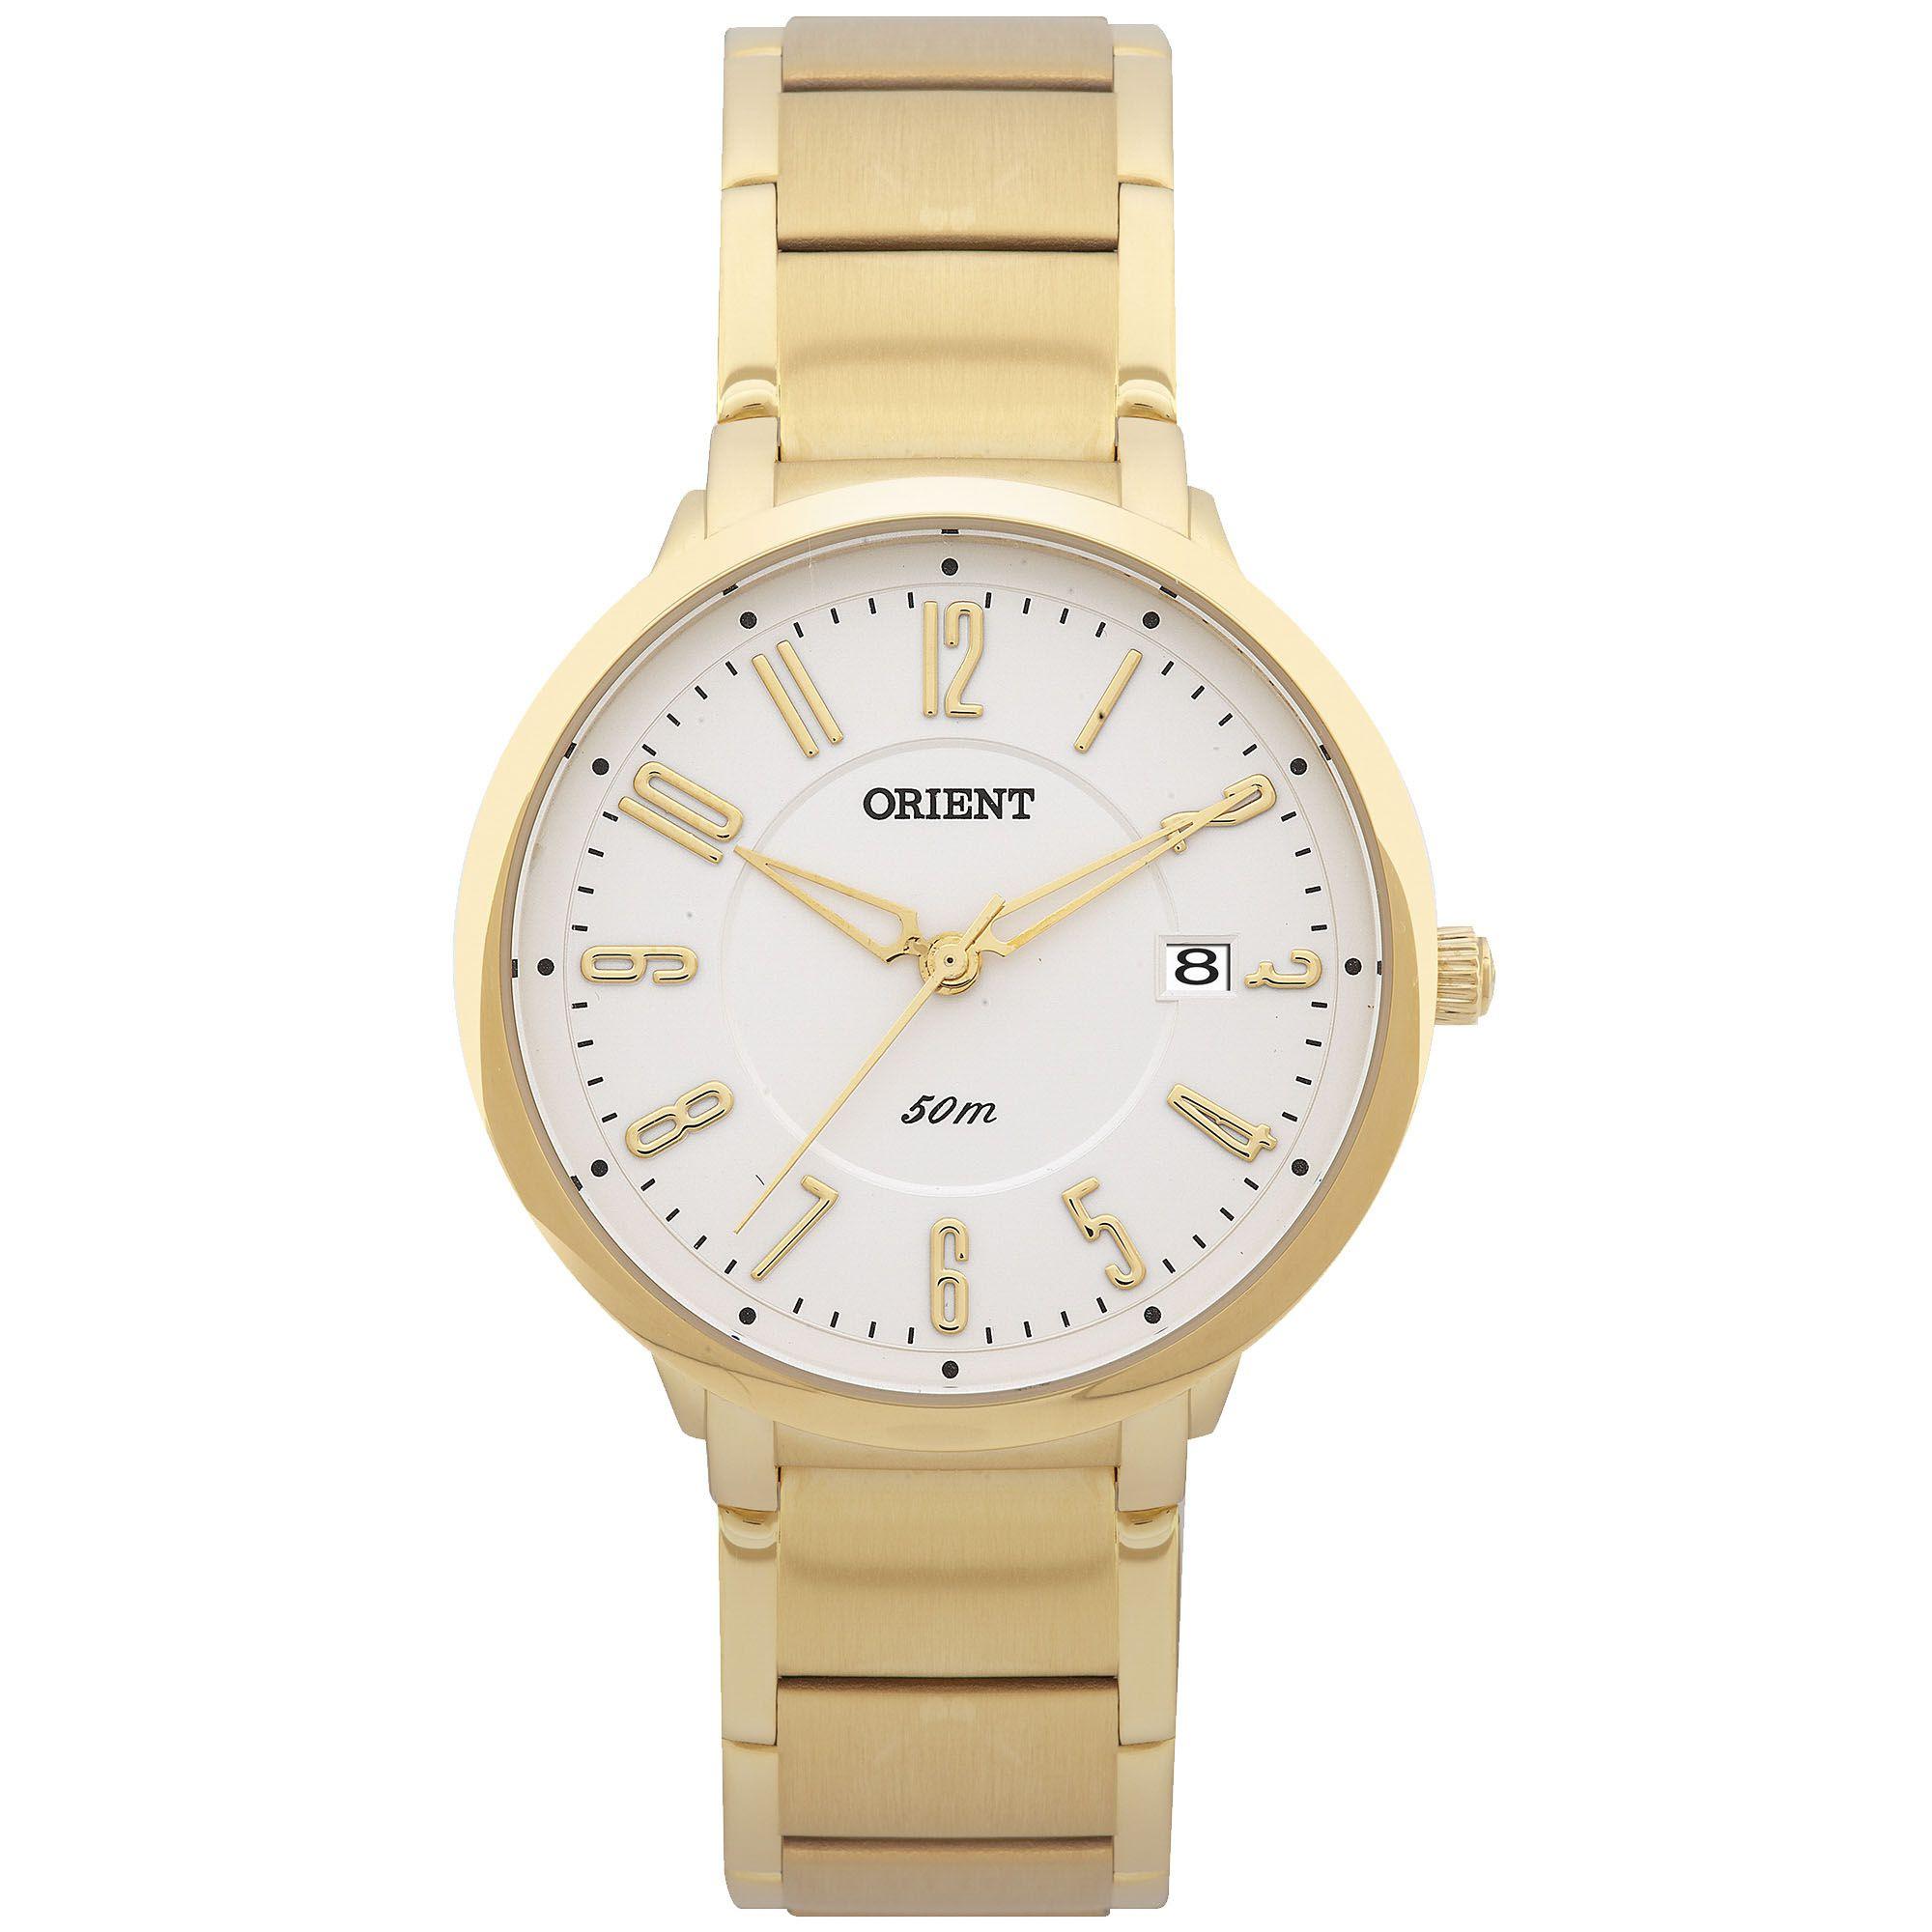 Relógio Feminino Orient FGSS1084 S2KX